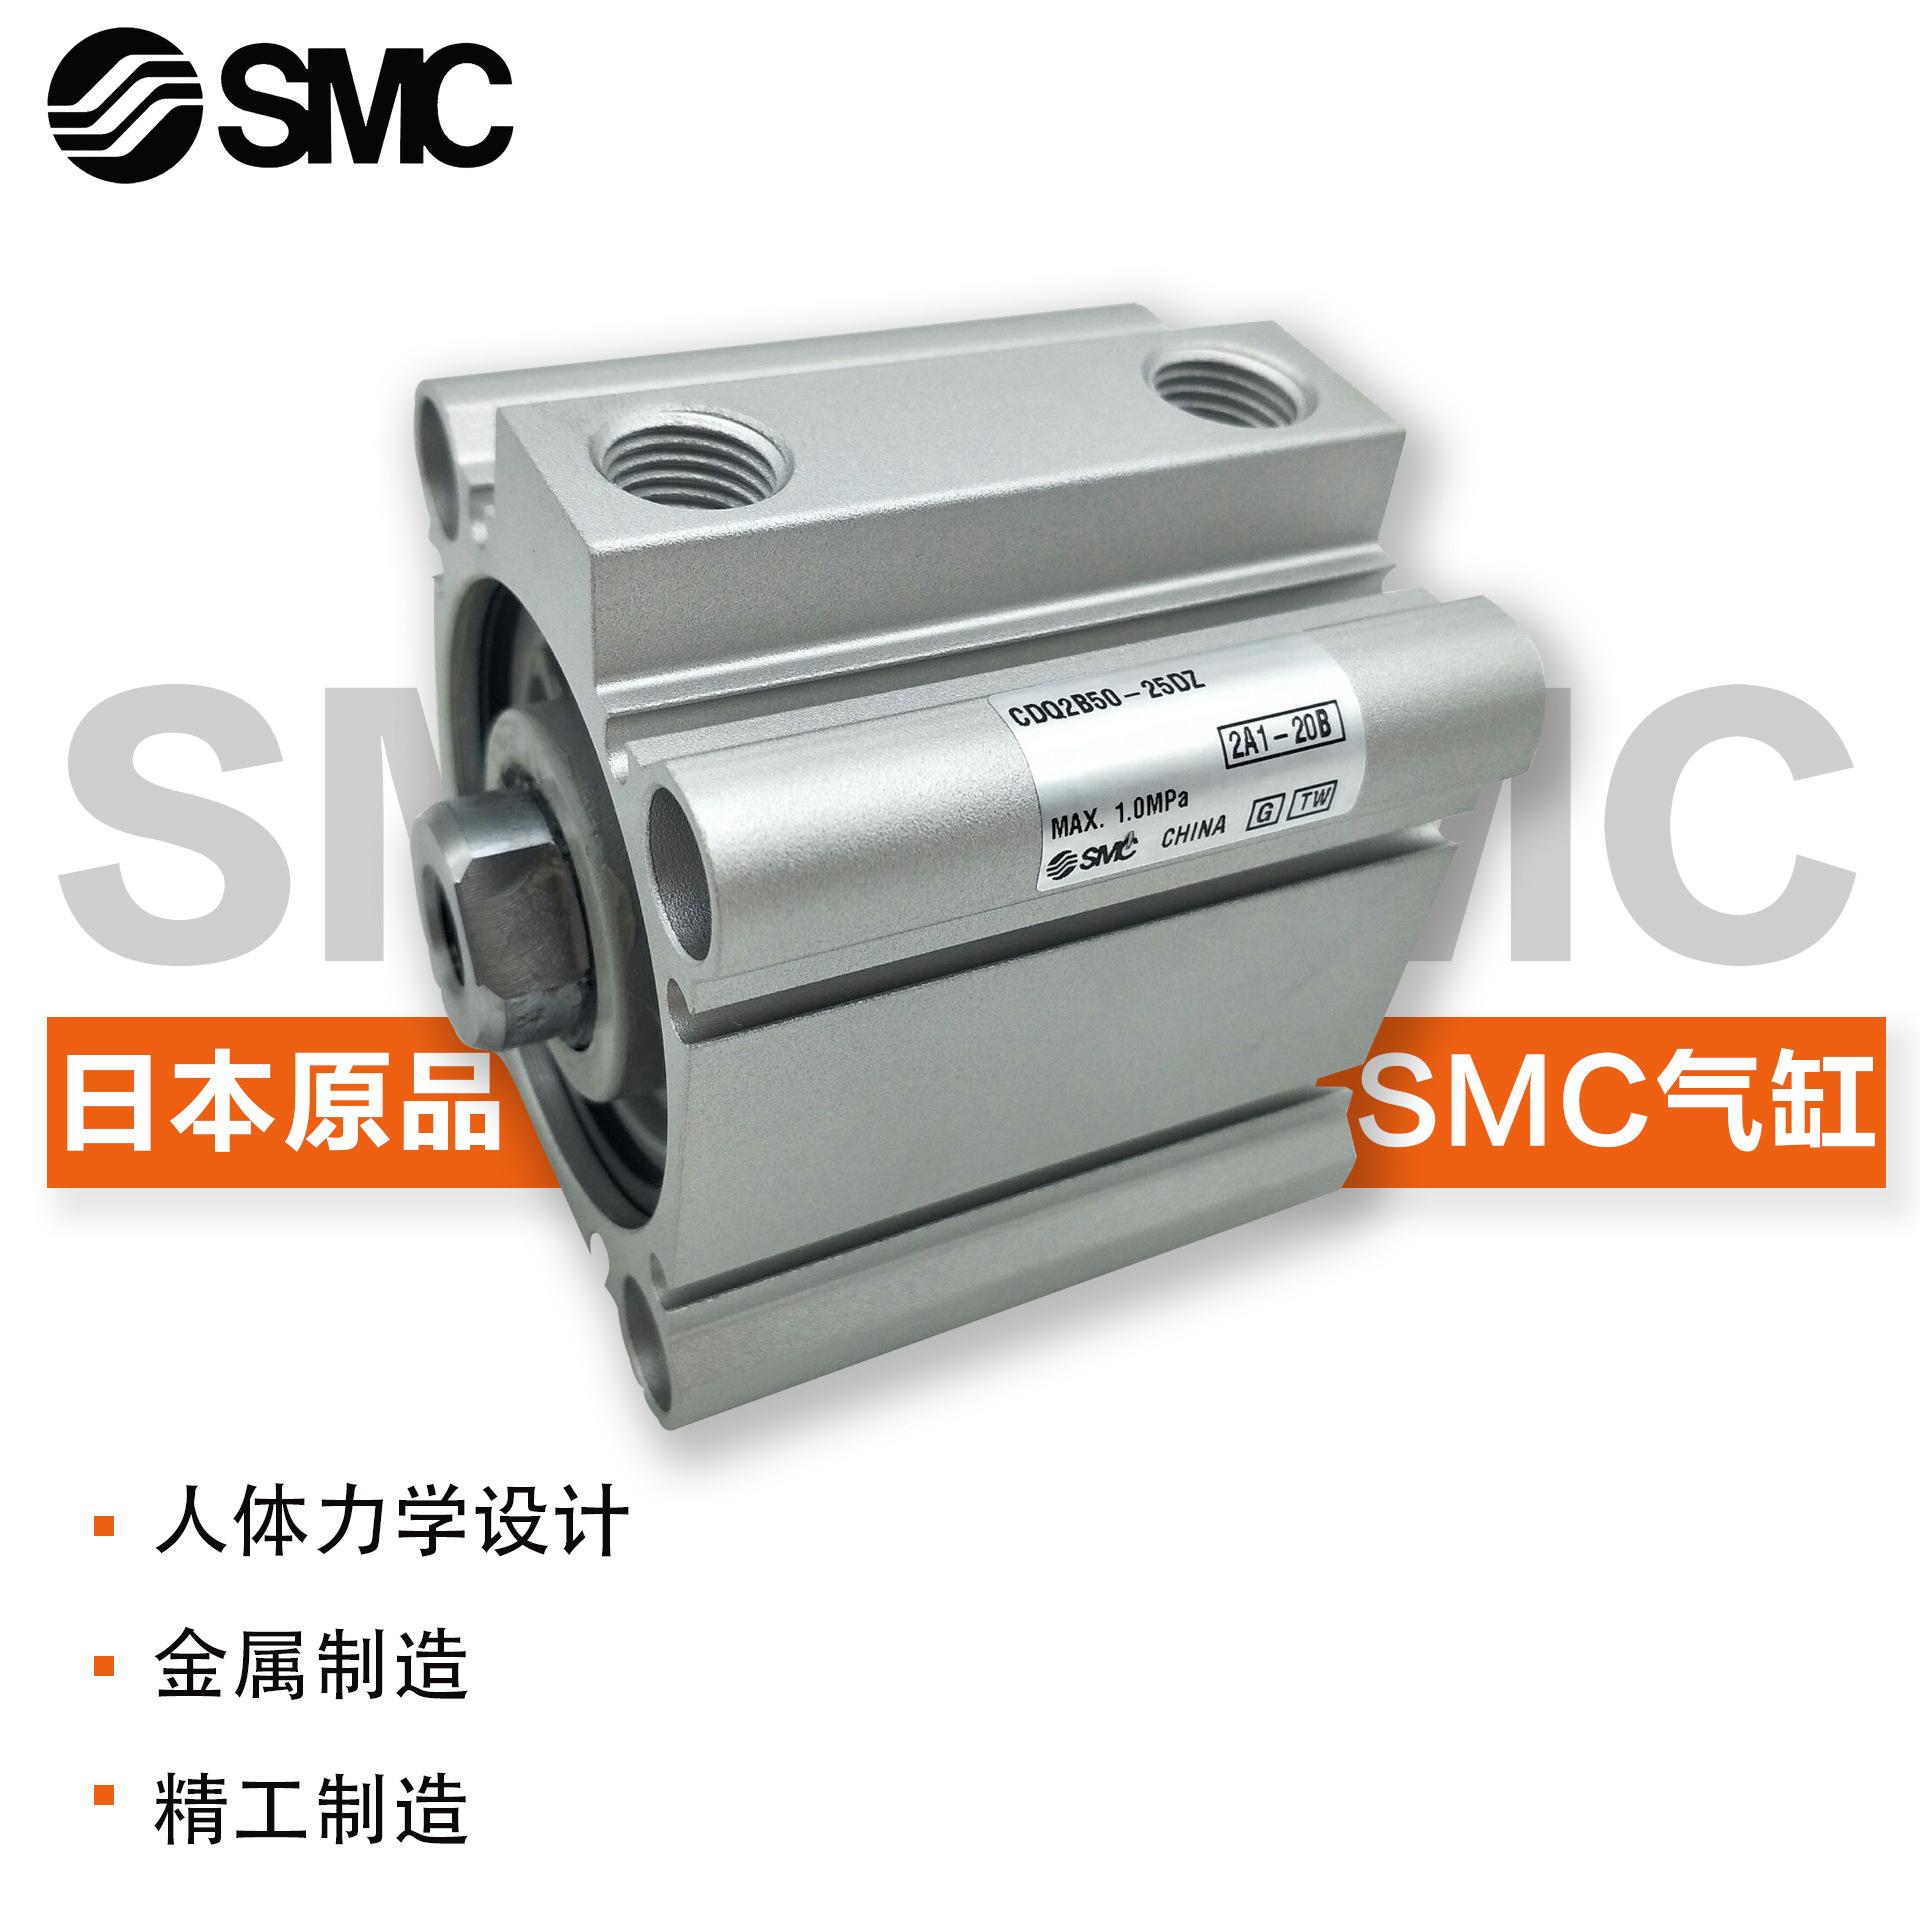 SMC气缸原装正品CDQ2B32-10DZ 薄型气缸